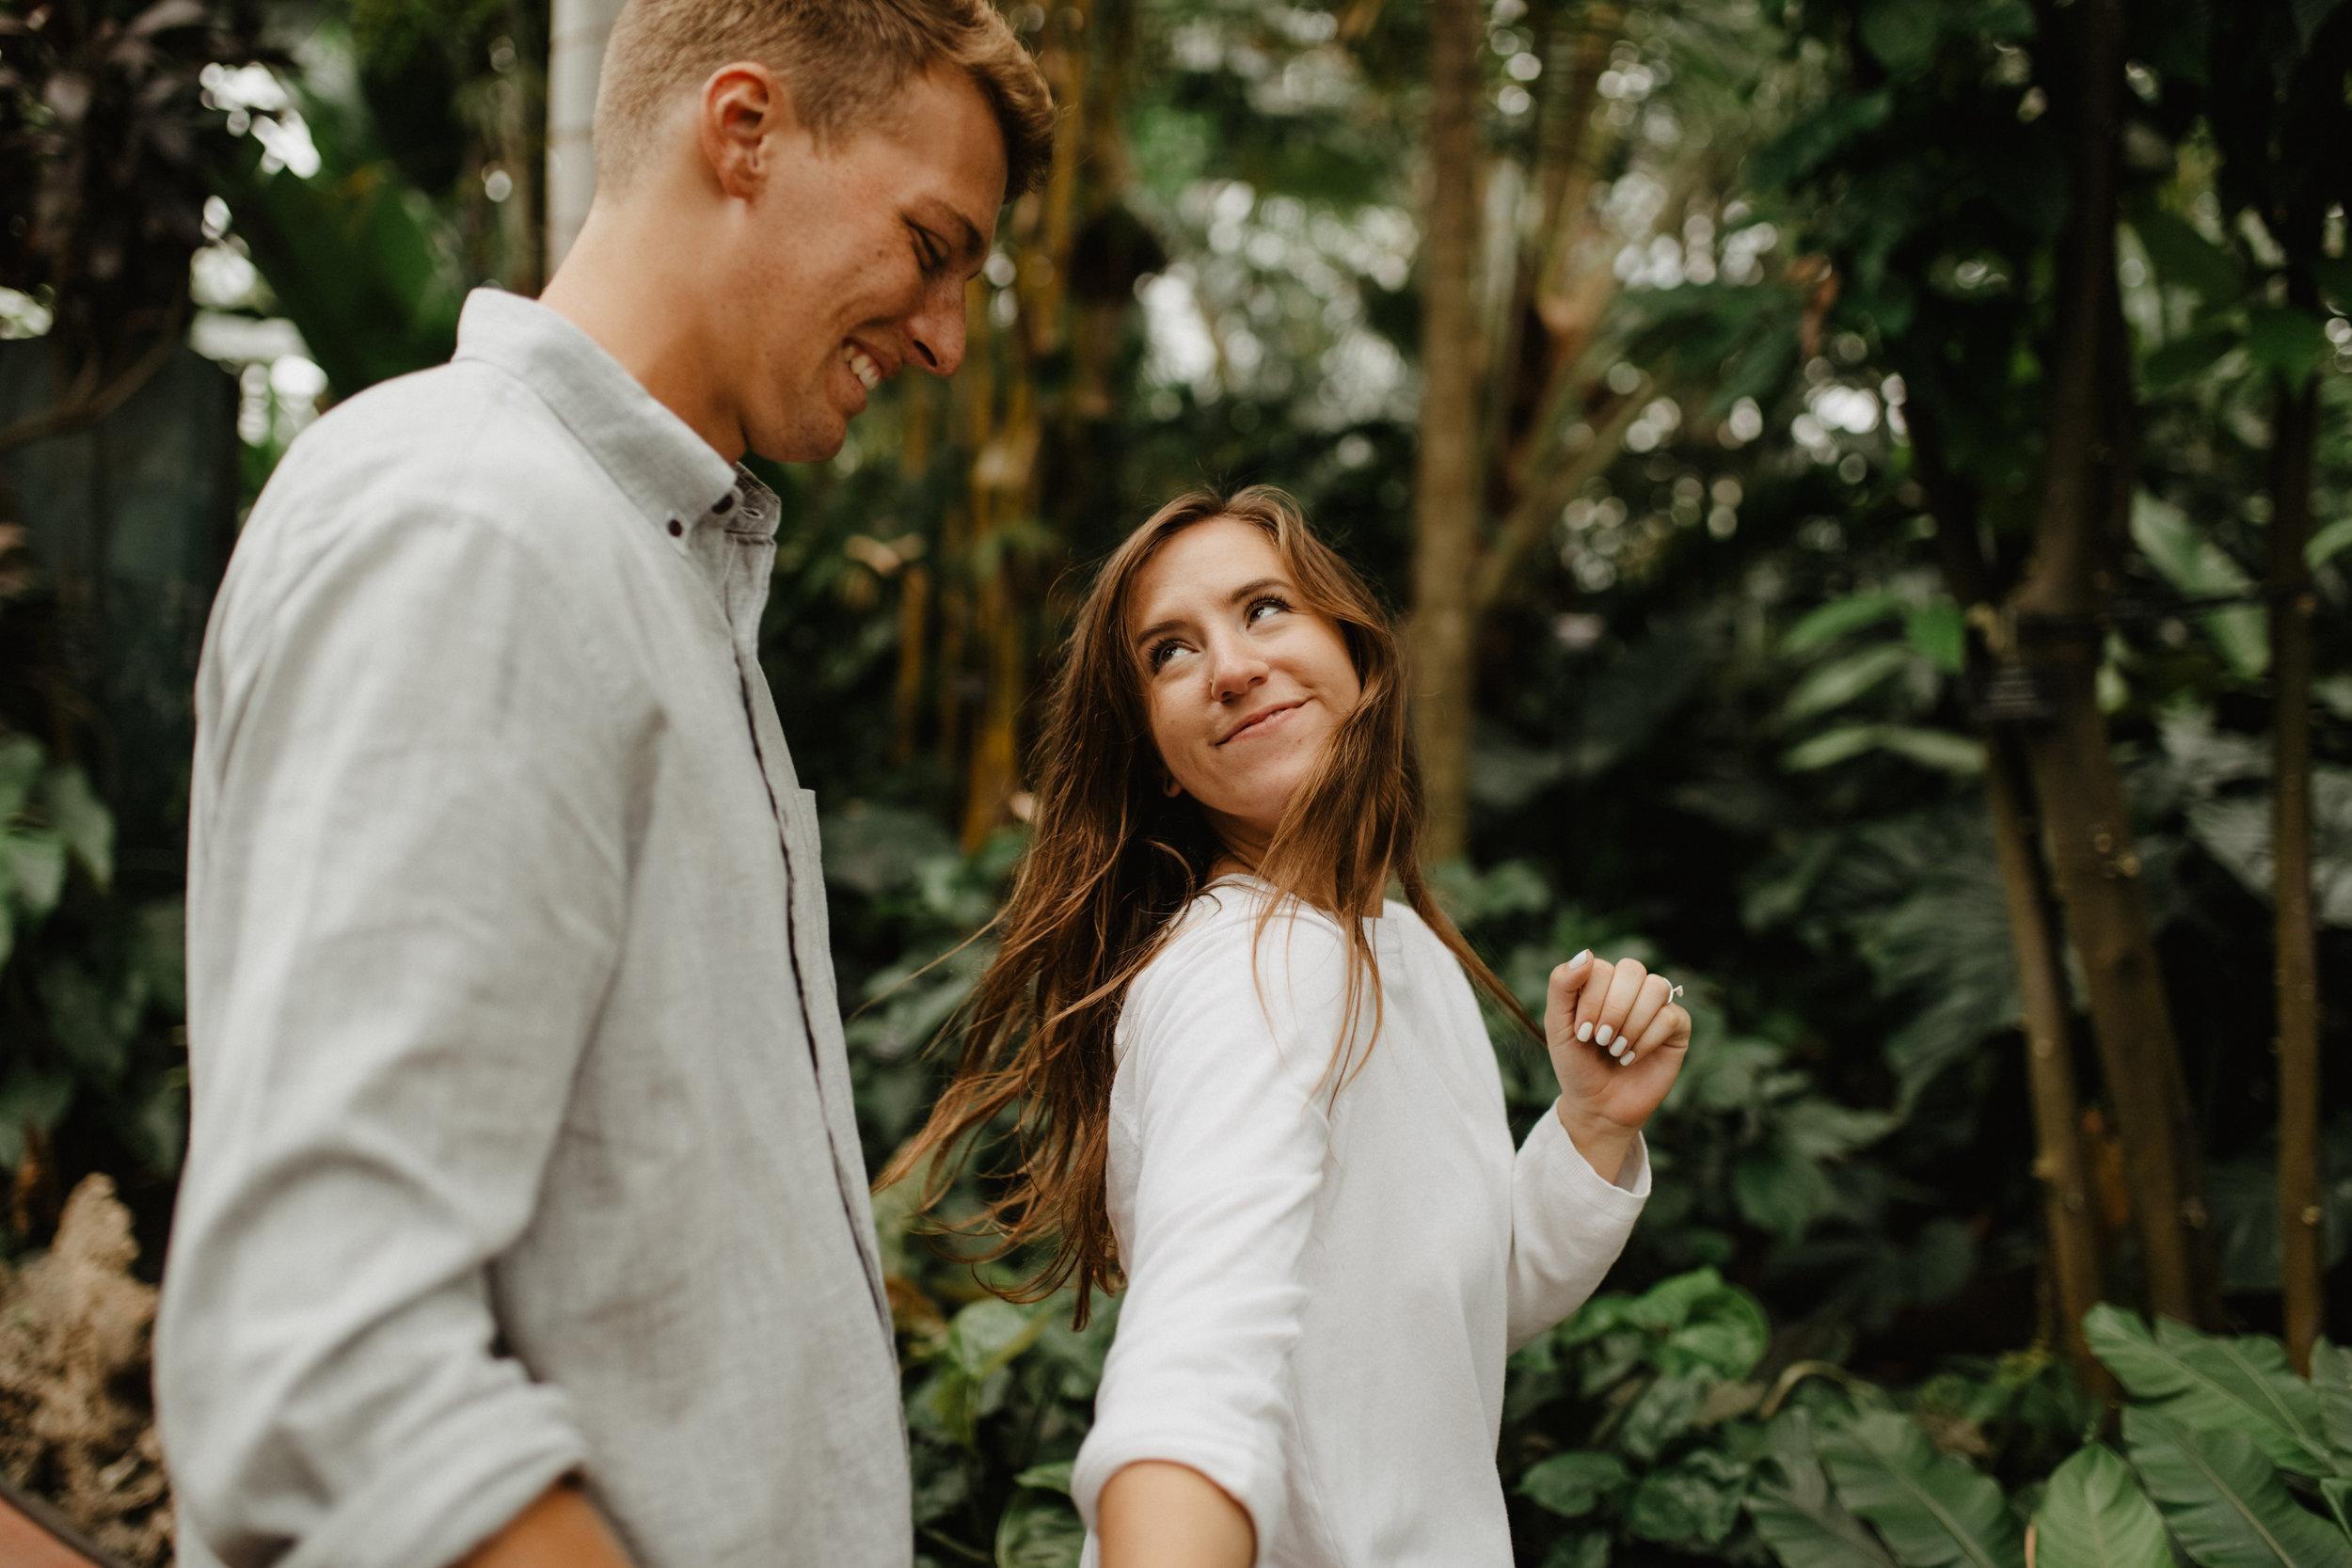 Taryn-Zak-Lincoln-Park-Conservatory-Engagement-28